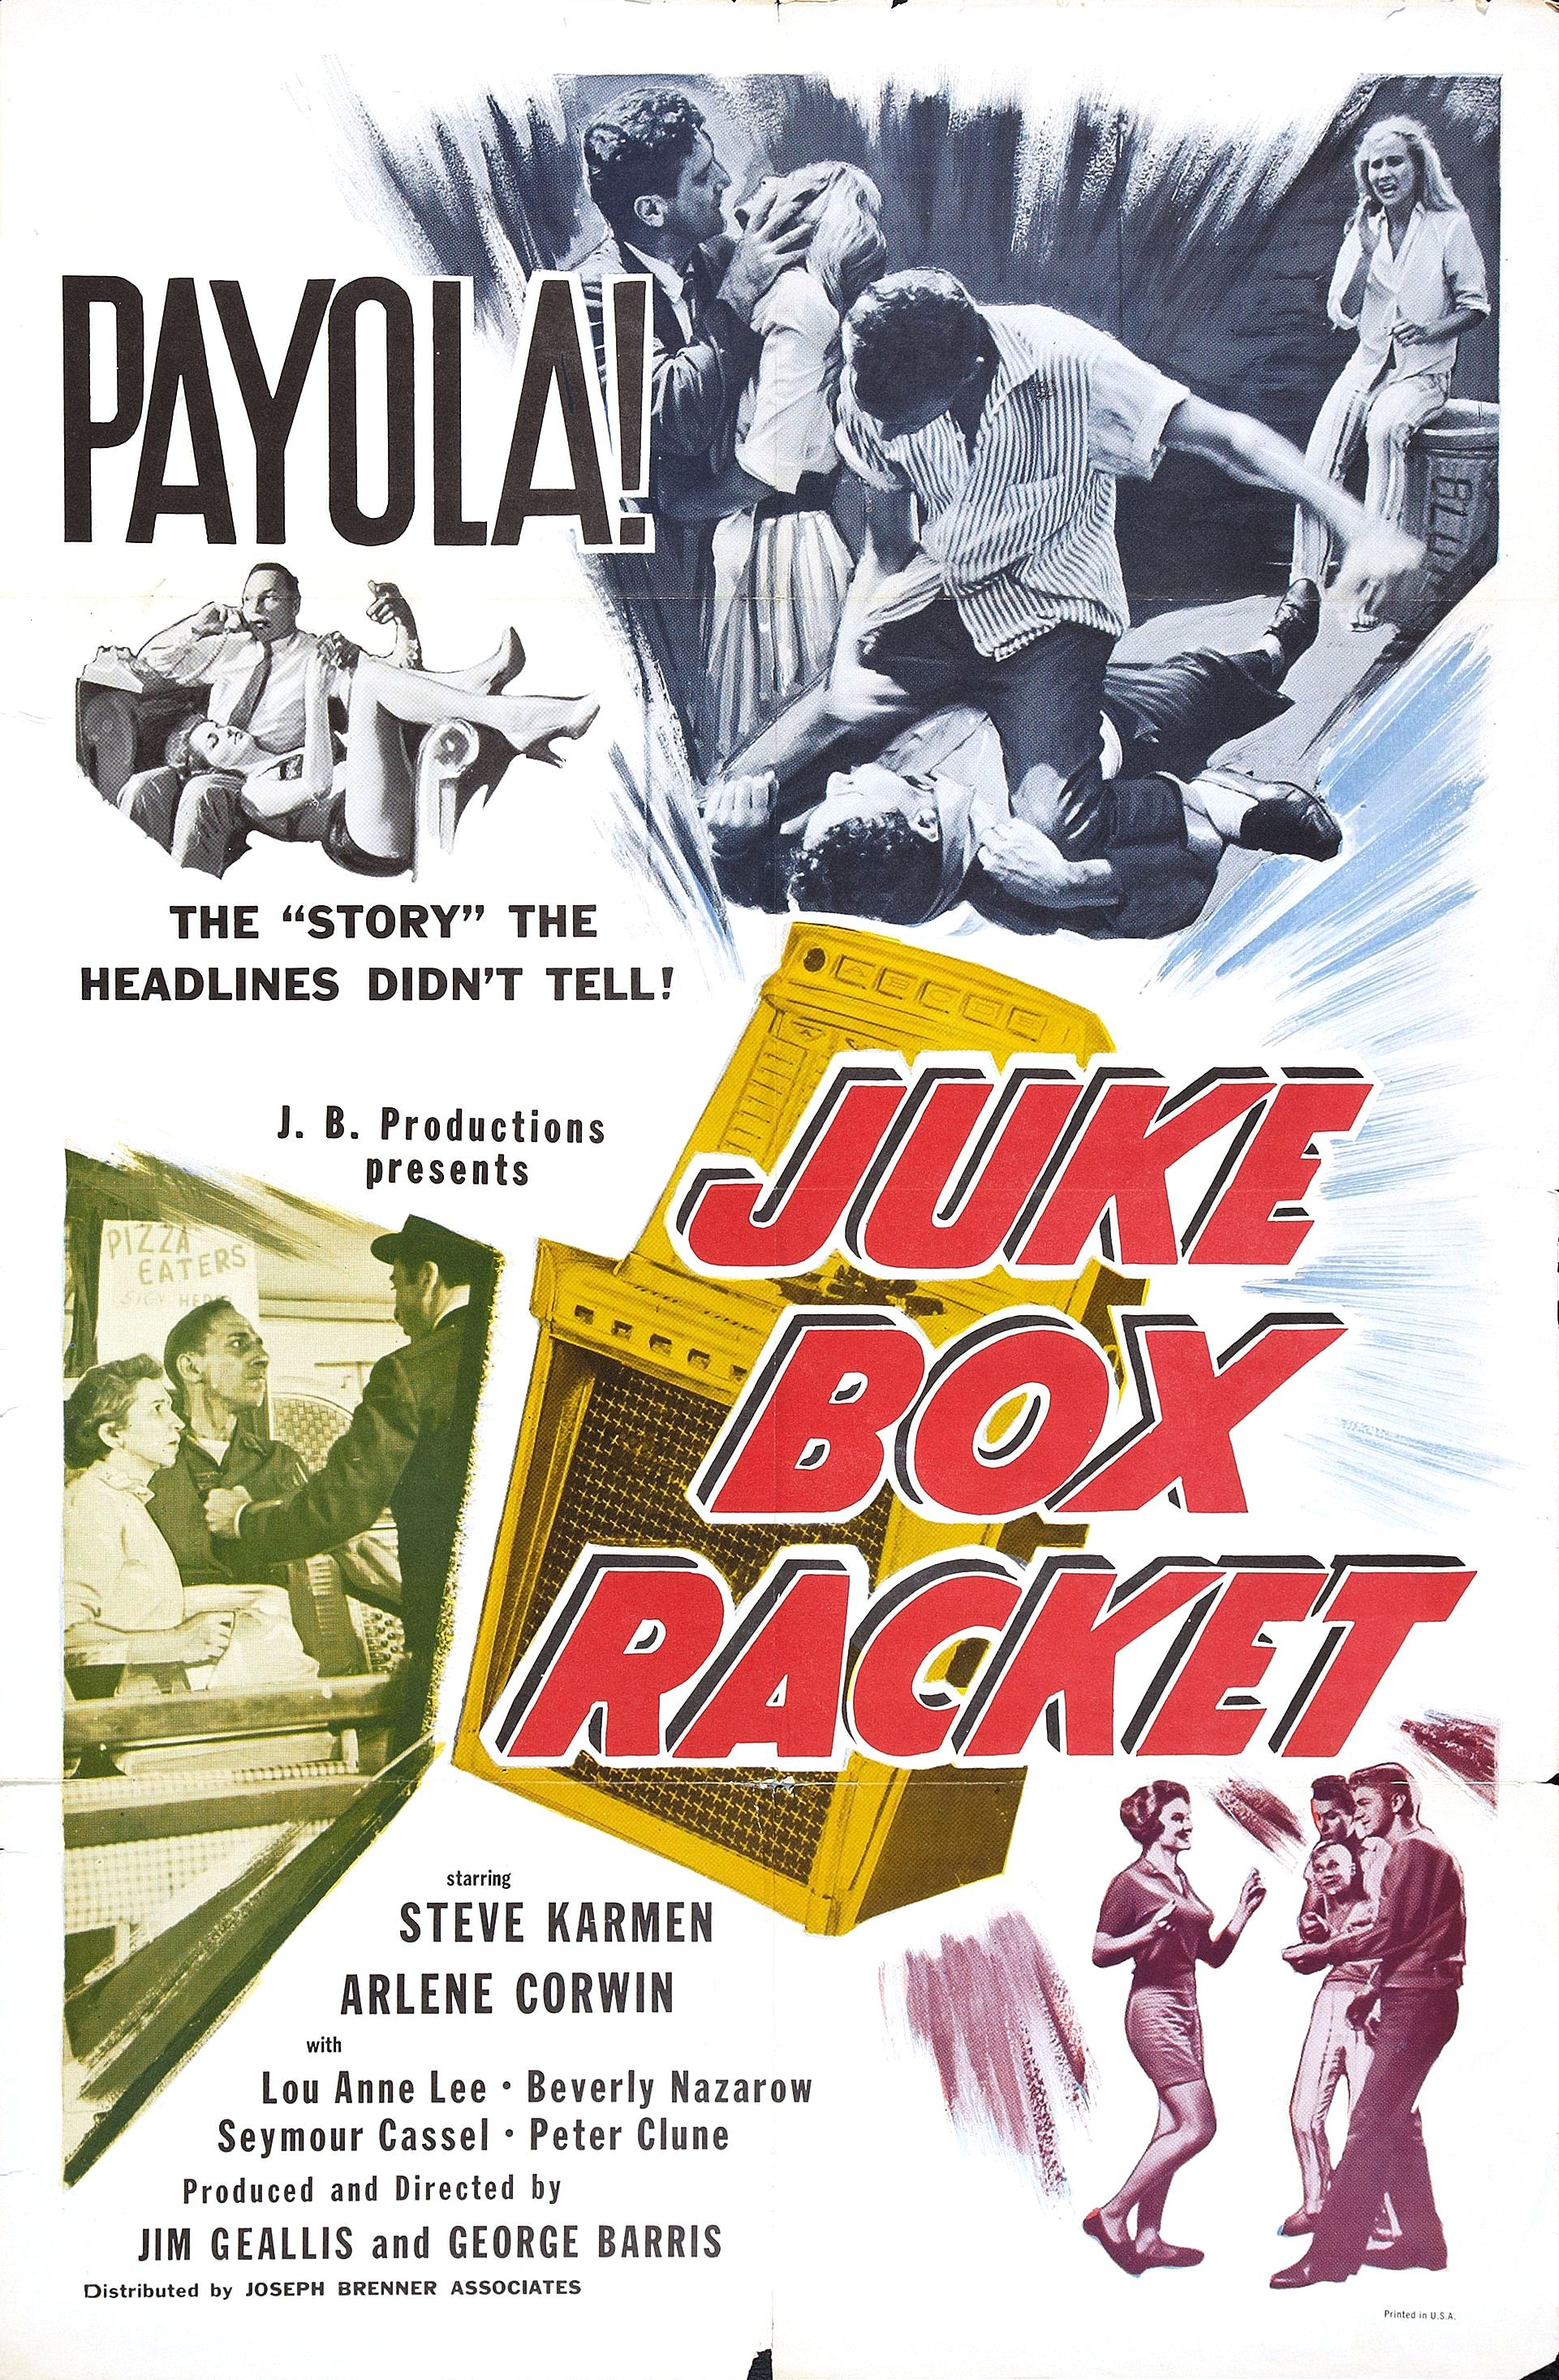 Juke Box Racket (1960)